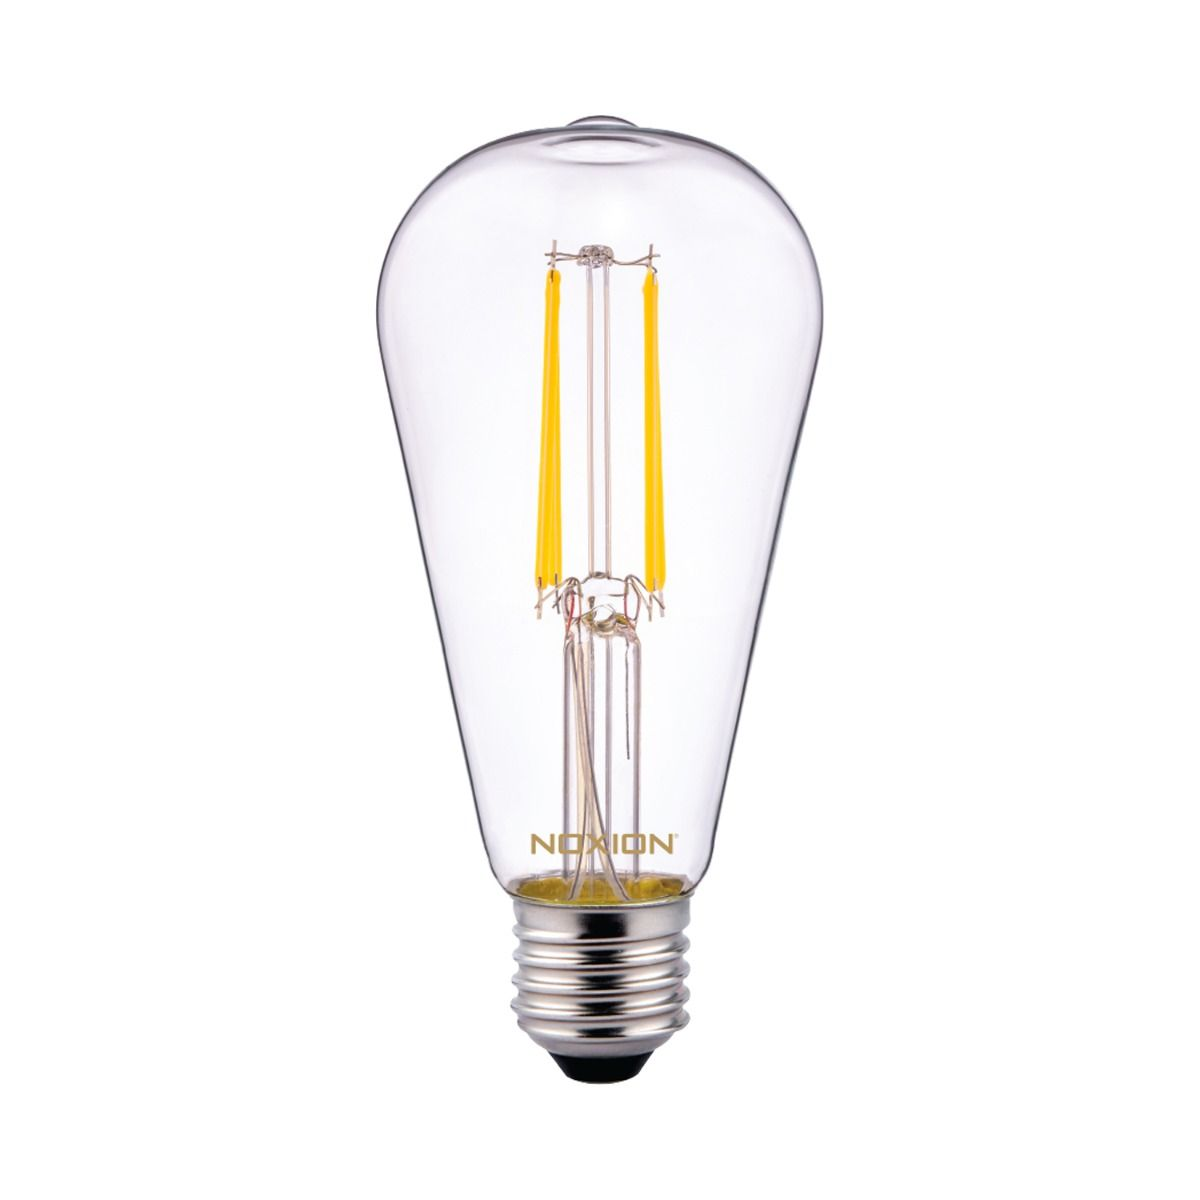 Noxion Lucent klassisch LED Fadenlampe ST64 E27 6.5W 827 Klar   Ersatz für 60W